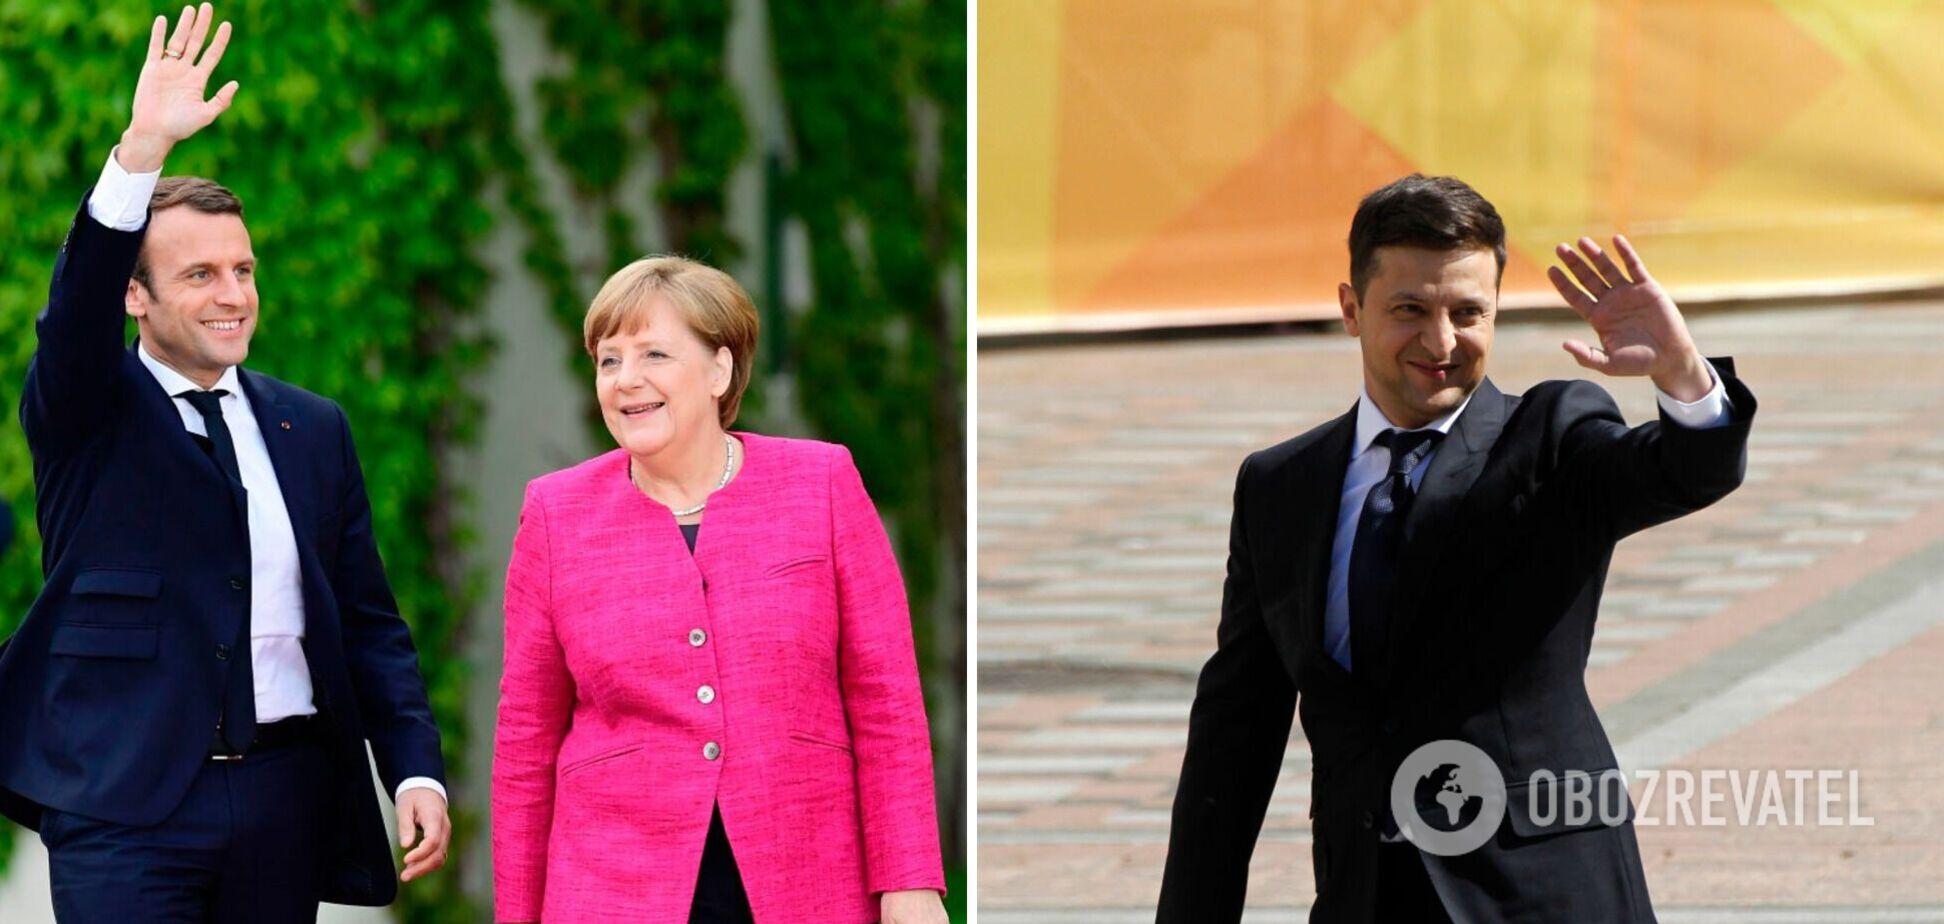 Президент Франції Еммануель Макрон, канцлерка ФРН Ангела Меркель і президент України Володимир Зеленський